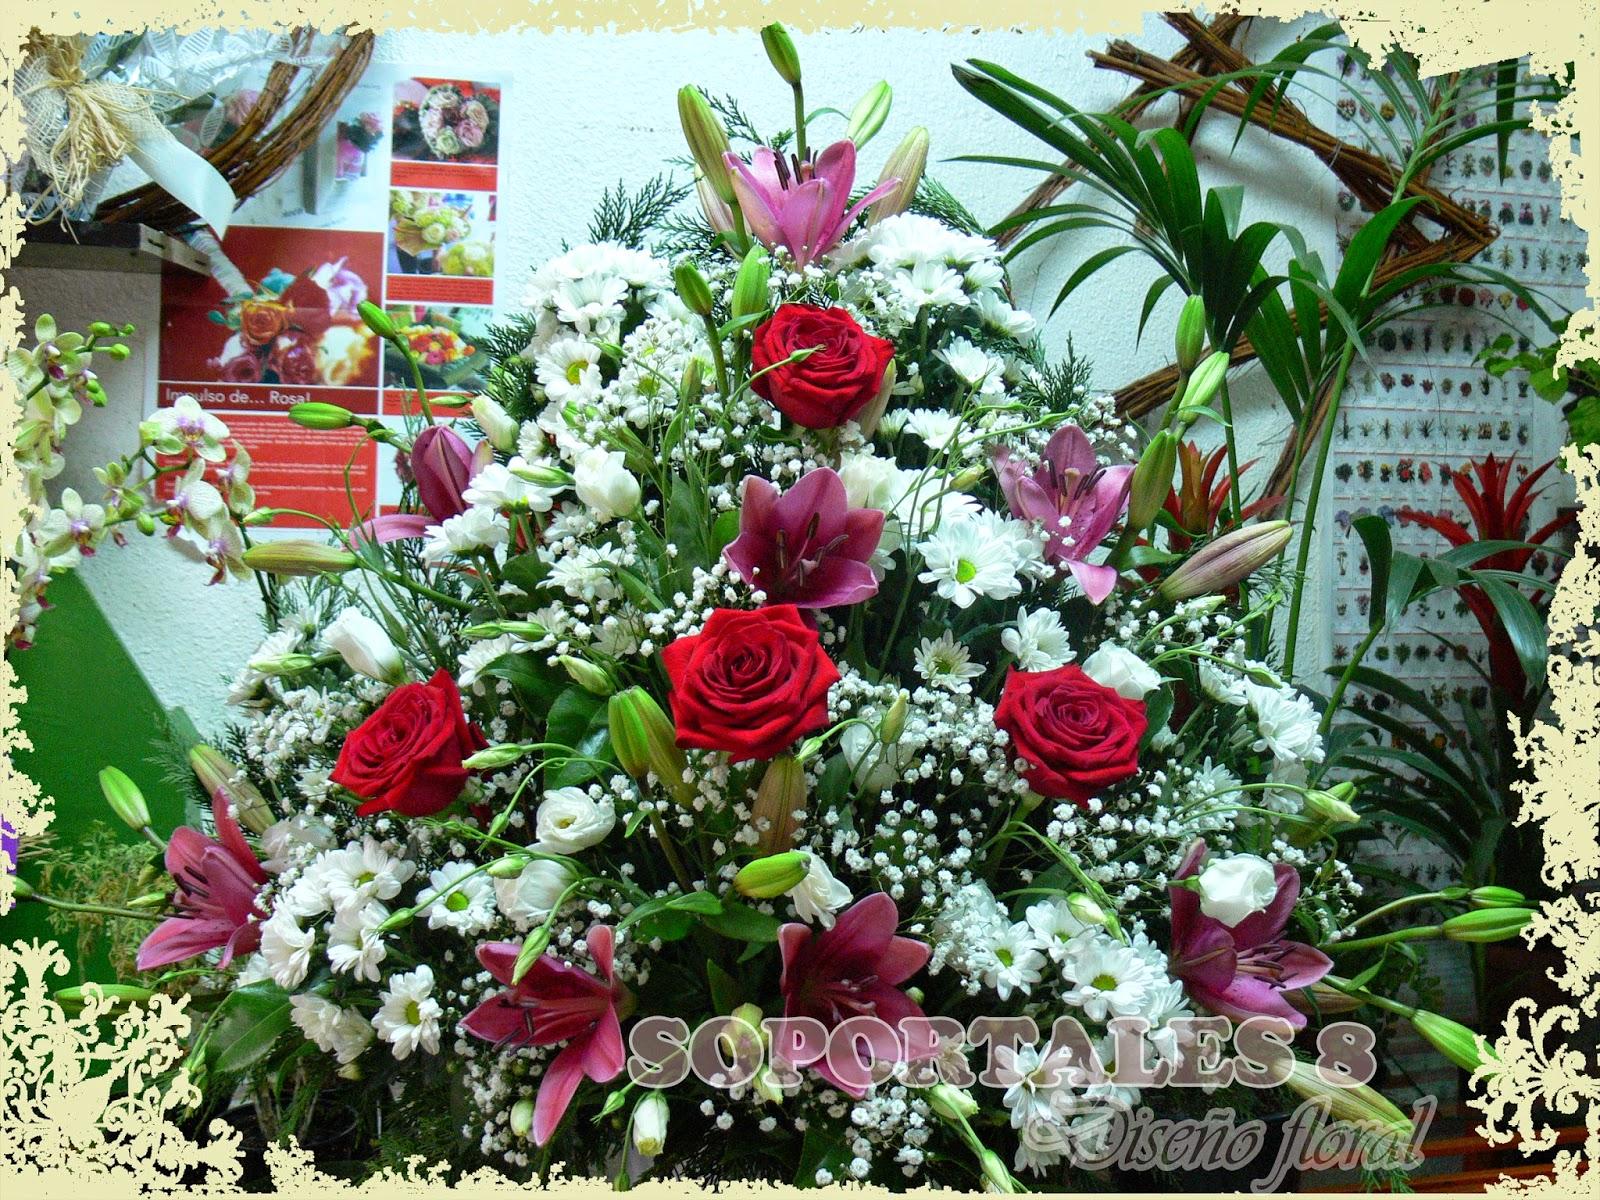 Fotos de ramos de flores - Fotos Centros Flores Naturales